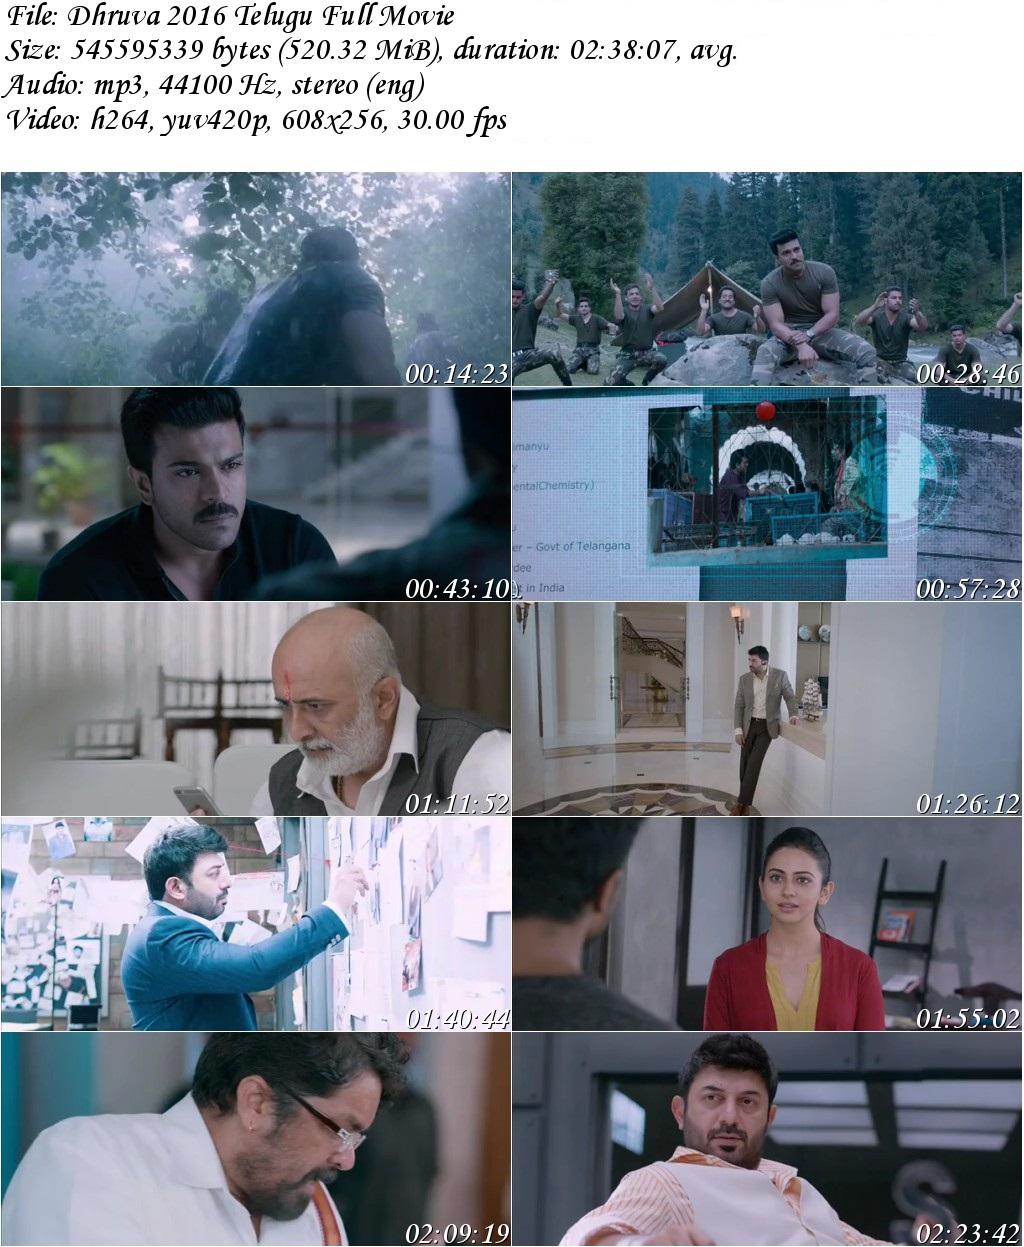 Dhruva (2016) Telugu Full Movie HDRip Dual Audio 500MB